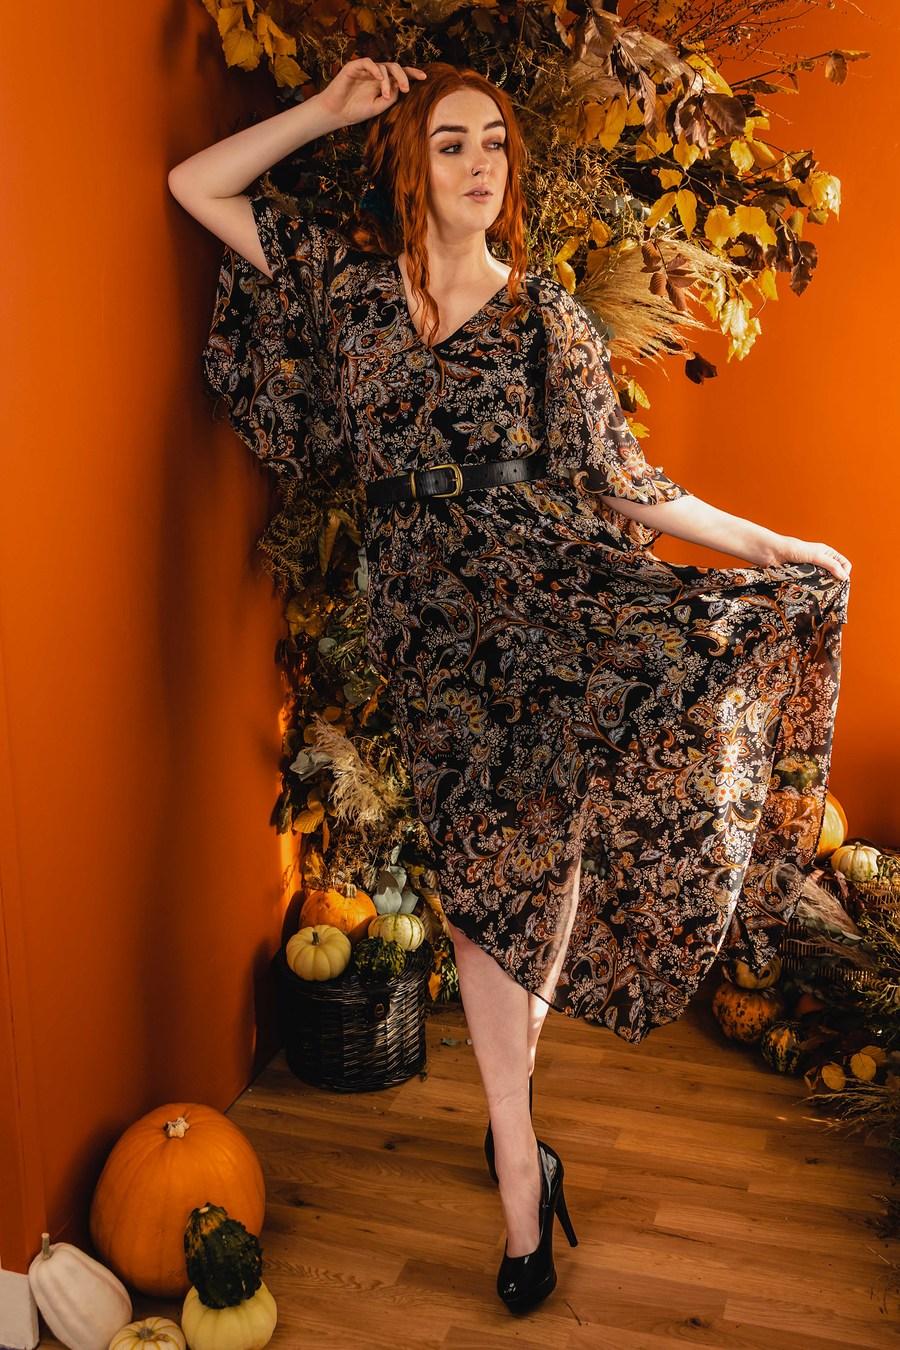 Photography by AyshiaScott, Model Molly-Mae, Taken at Fareham Studio / Uploaded 5th November 2020 @ 10:20 PM